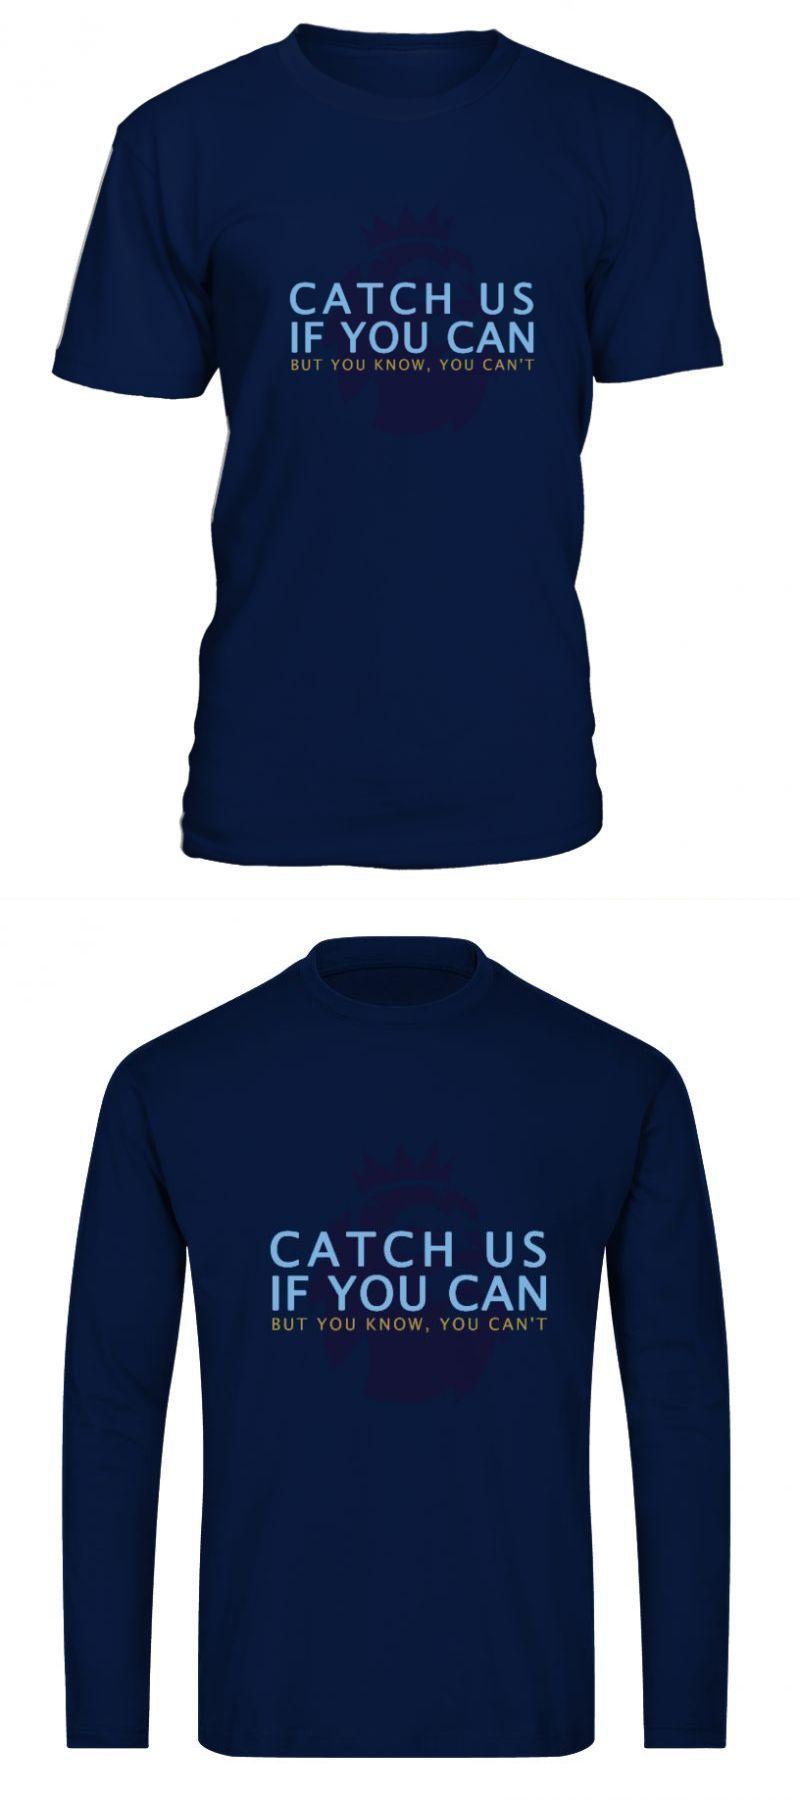 b59cec93 Football t shirt online catch us if you can ! the football t-shirt  #football #shirt #online #catch #us #if #you #can #the #t-shirt #liverpool  #round #neck ...